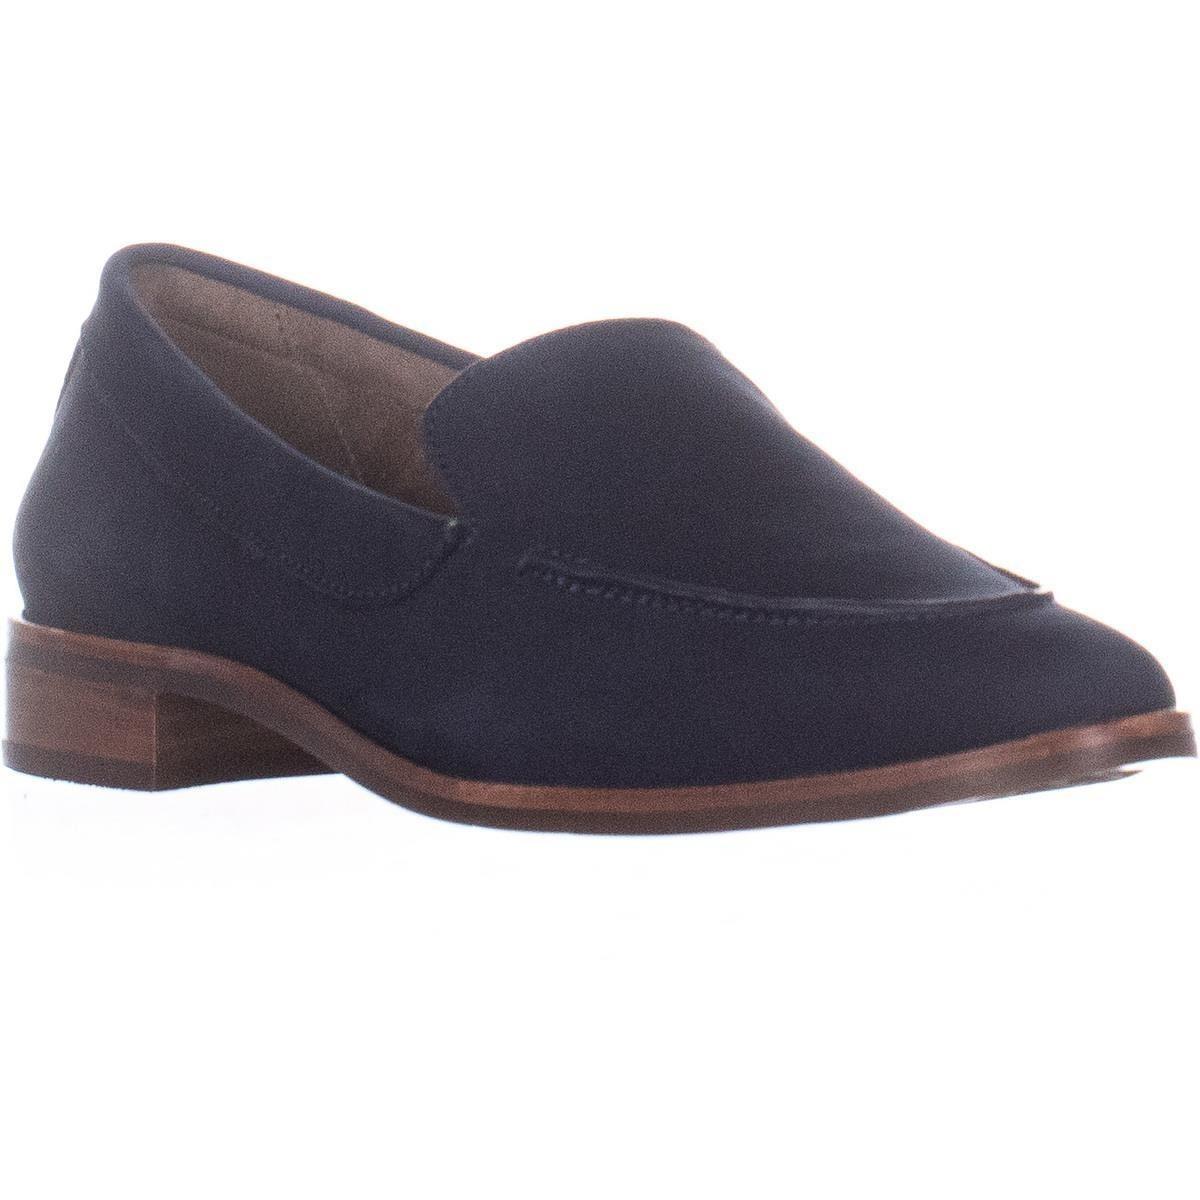 a28df23bcf3 Shop Aerosoles East Side Loafers